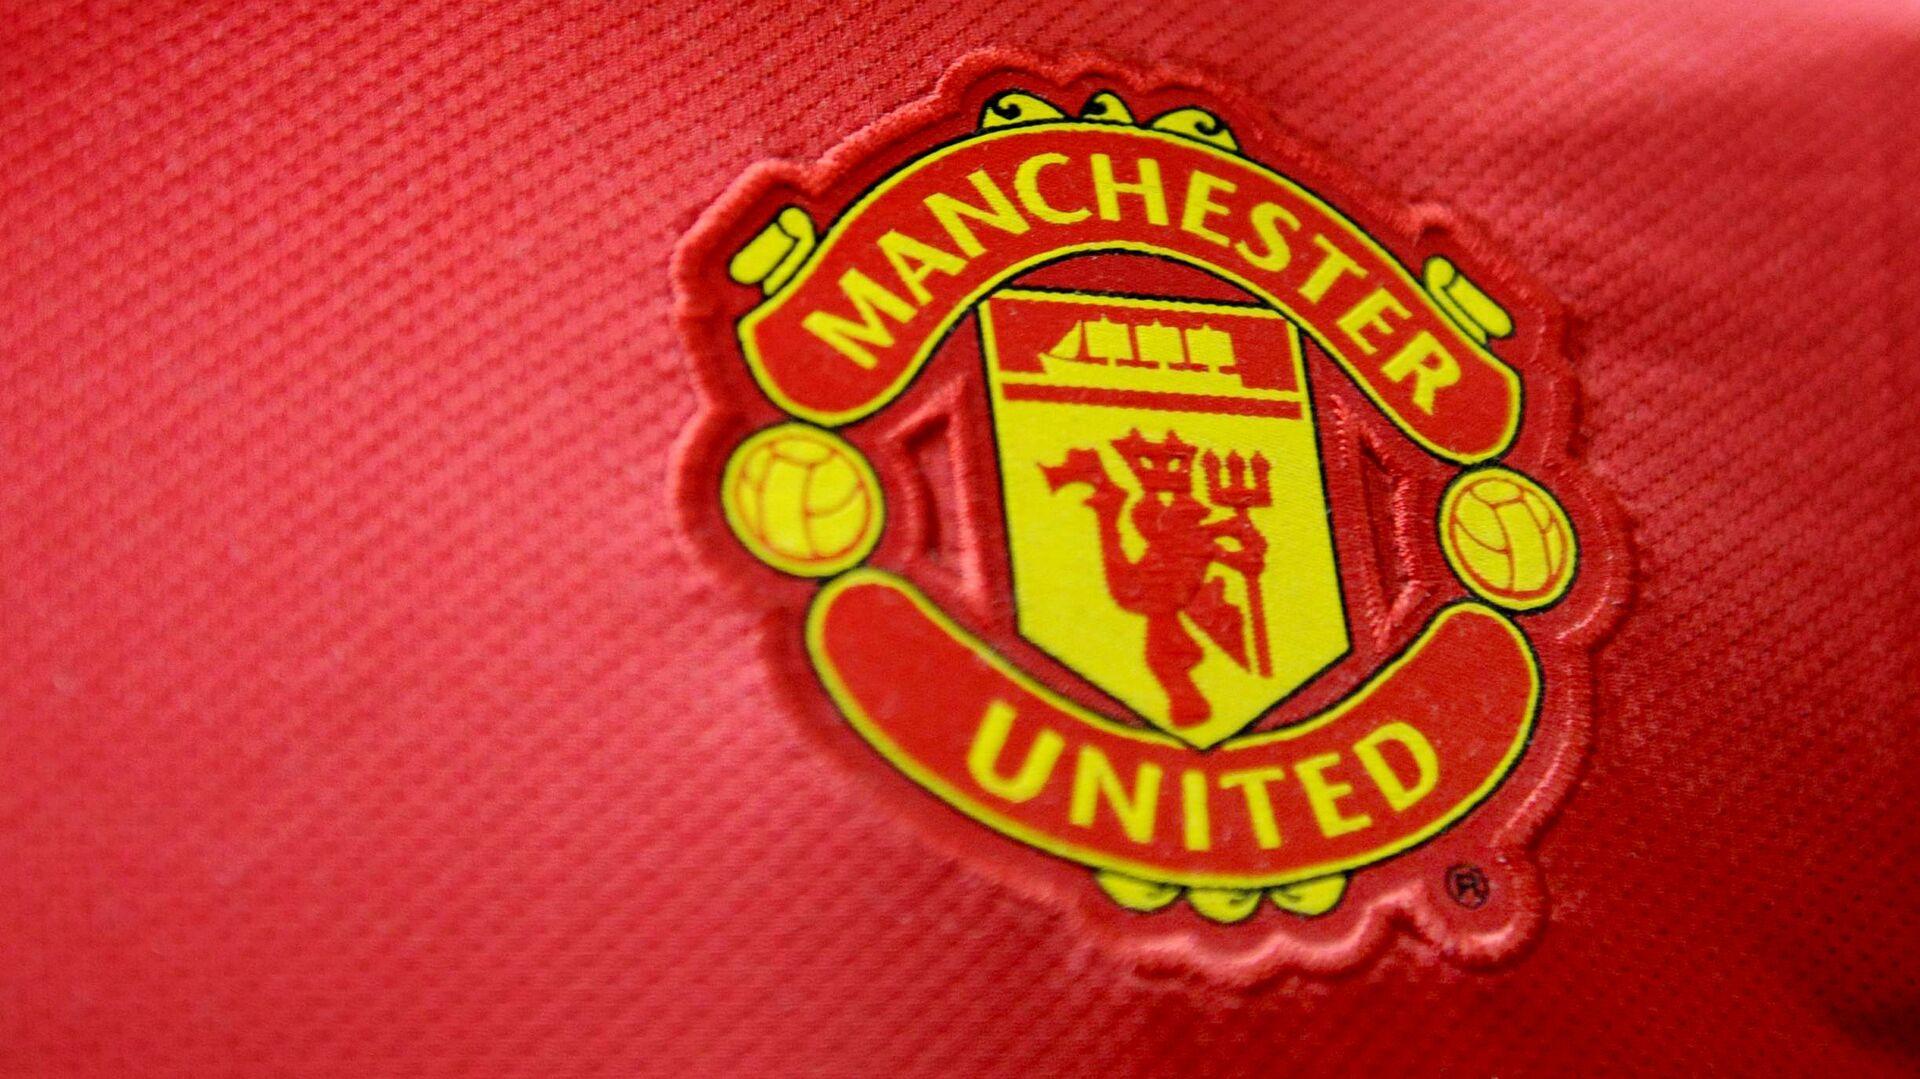 Логотип английского футбольного клуба Манчестер Юнайтед - РИА Новости, 1920, 19.09.2020